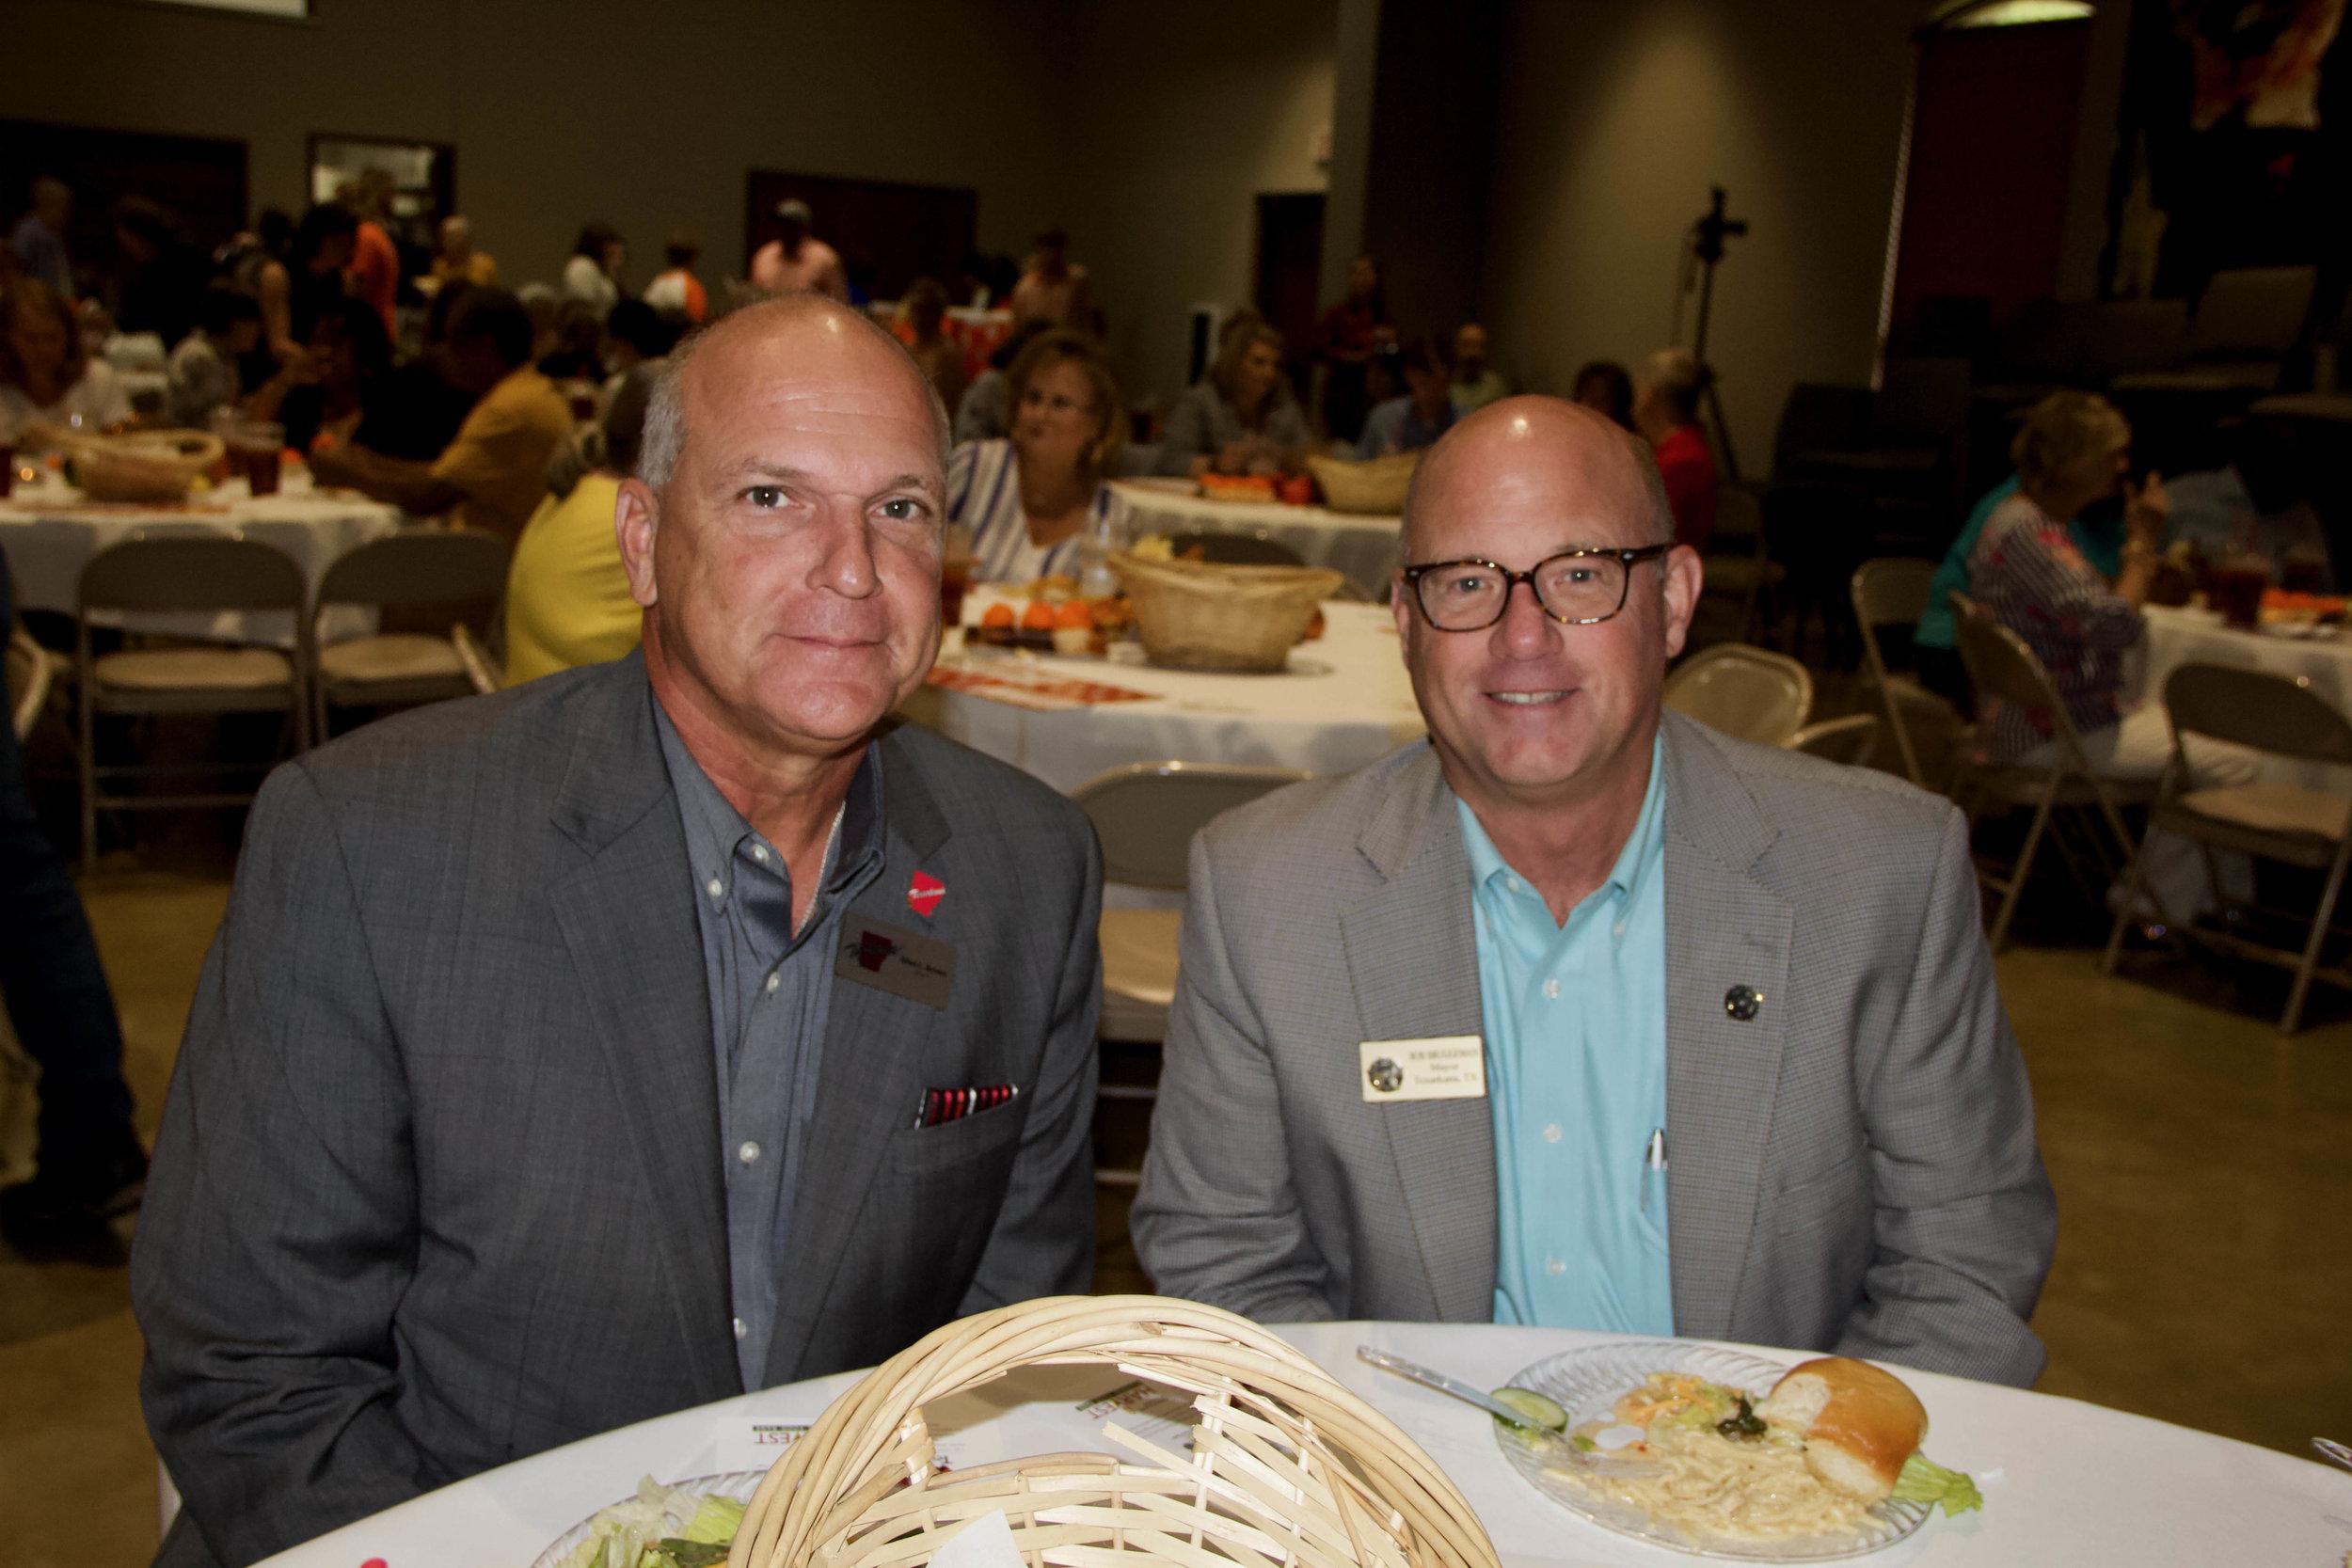 Mayor Allen Brown and Mayor Bob Bruggeman